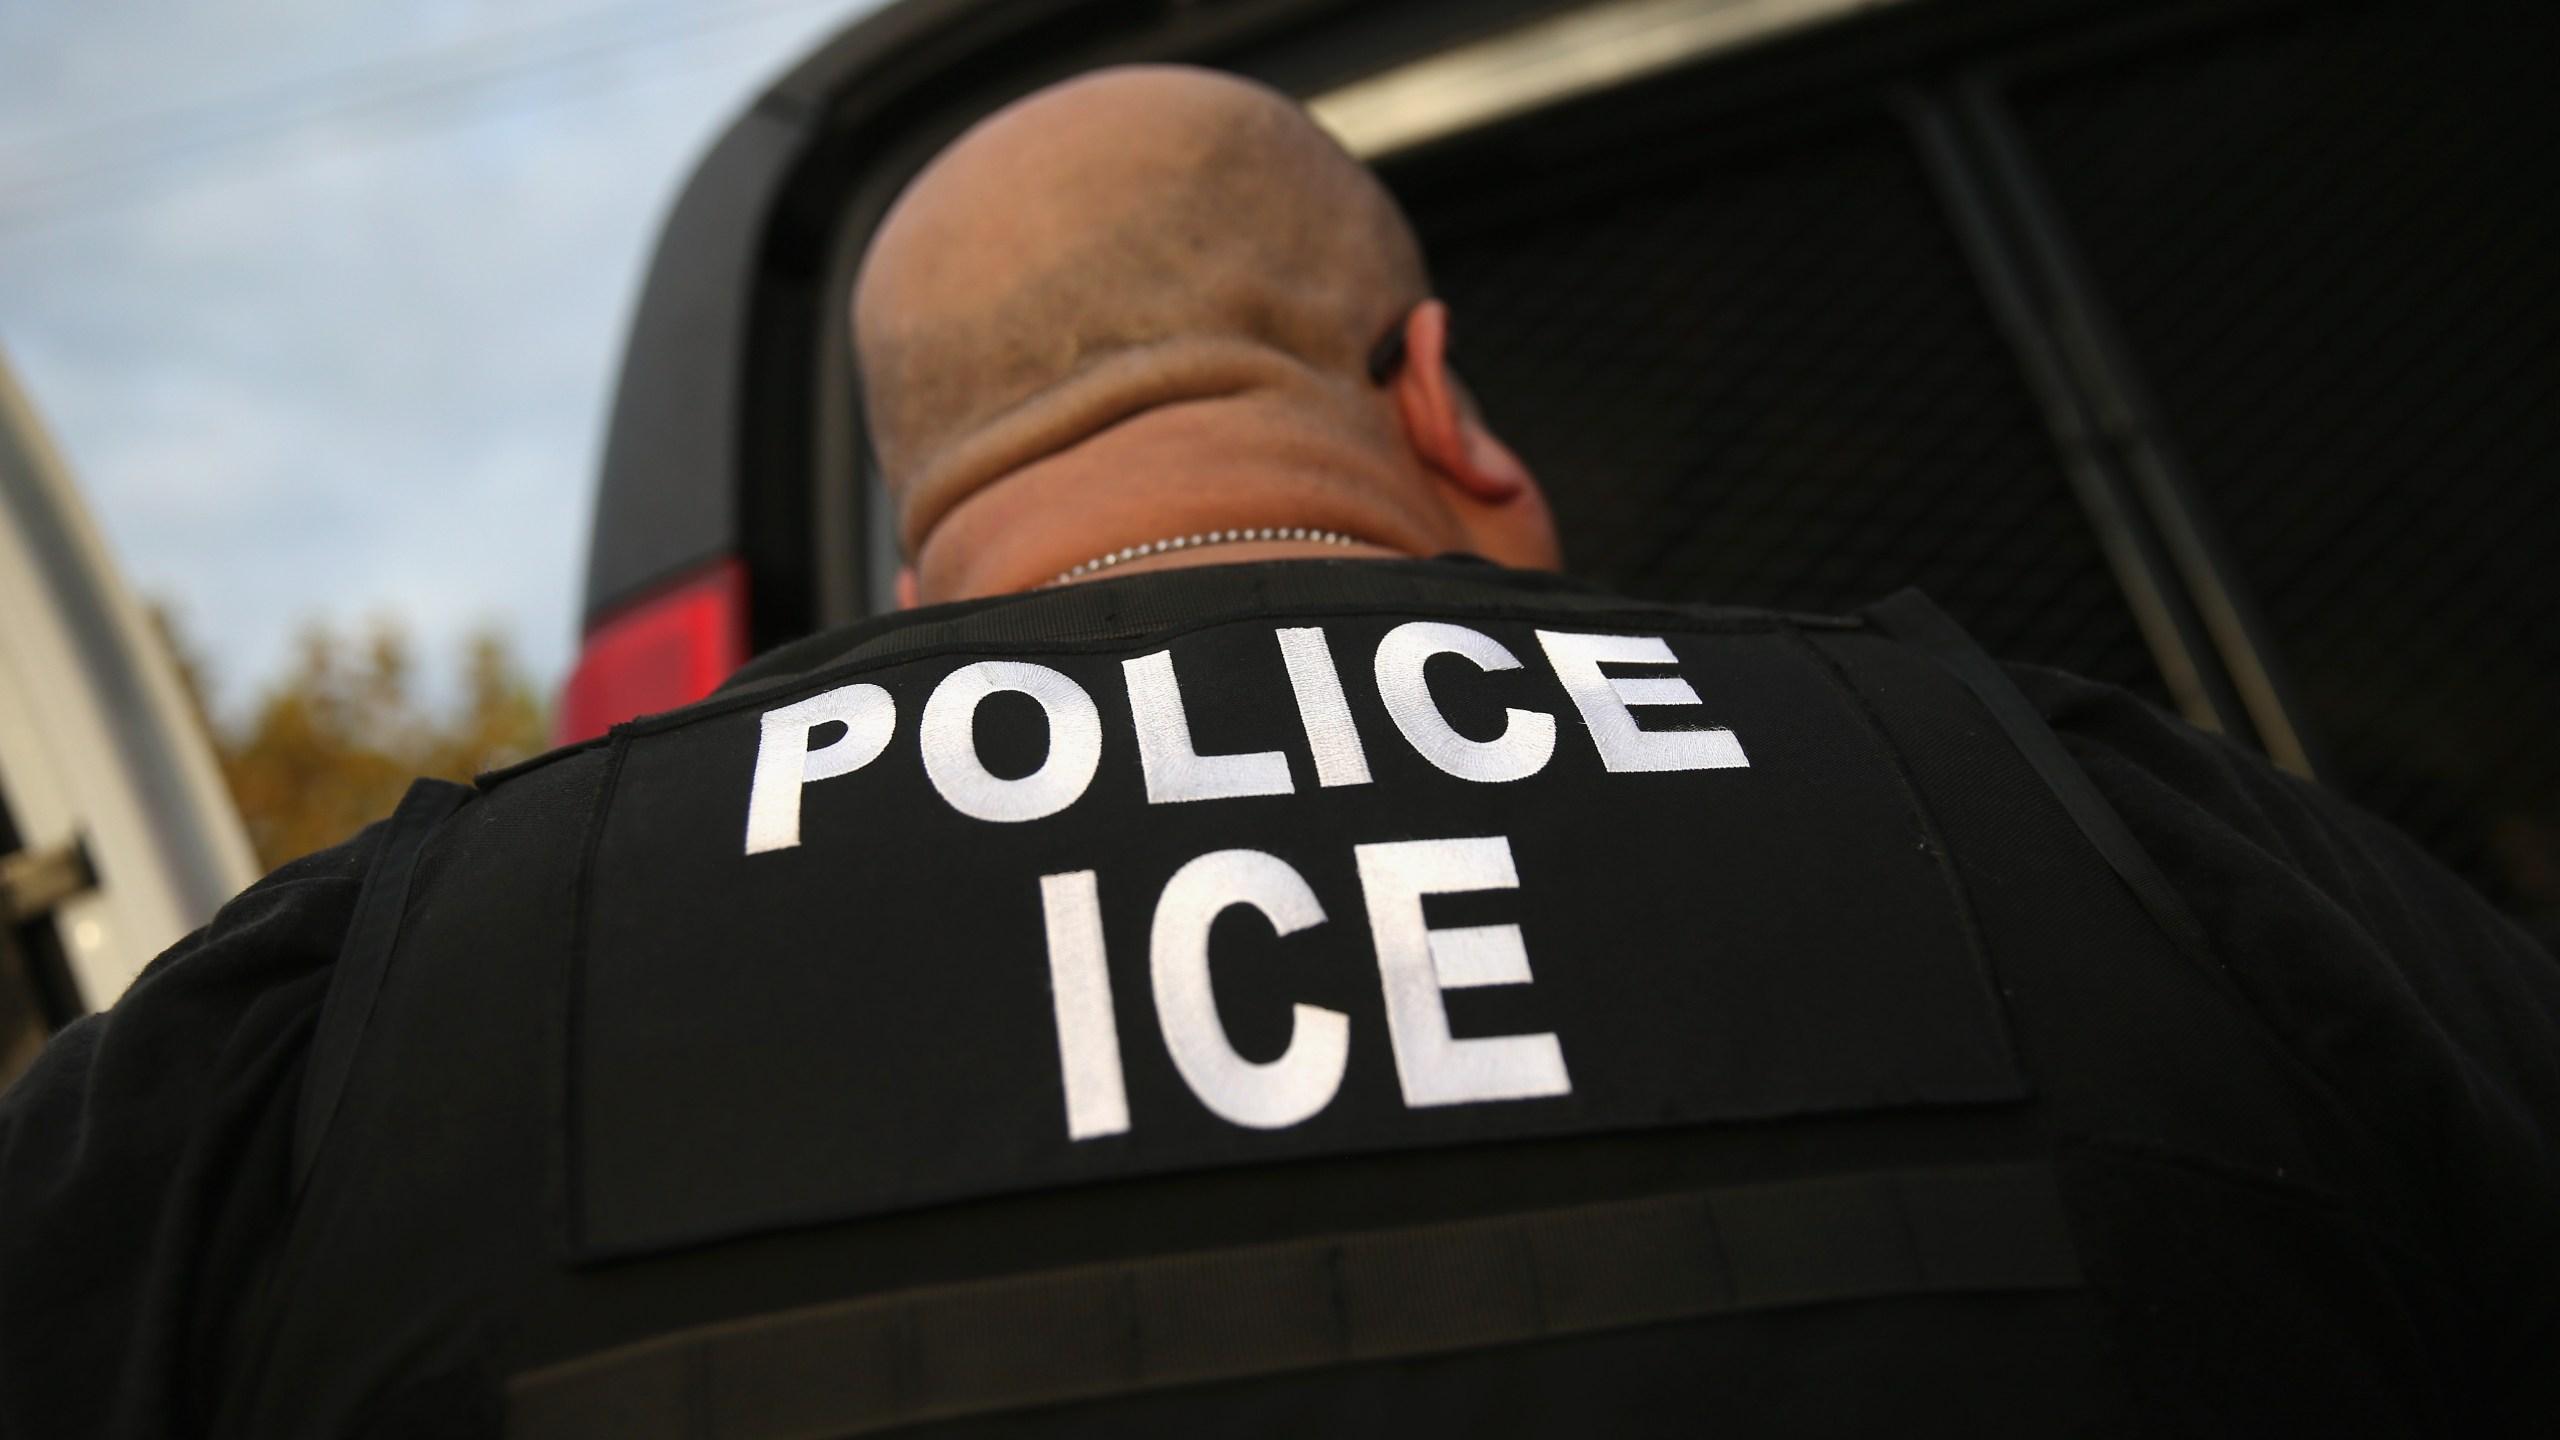 ICE Agents Detain Suspected Undocumented Immigrants In Raids_729642